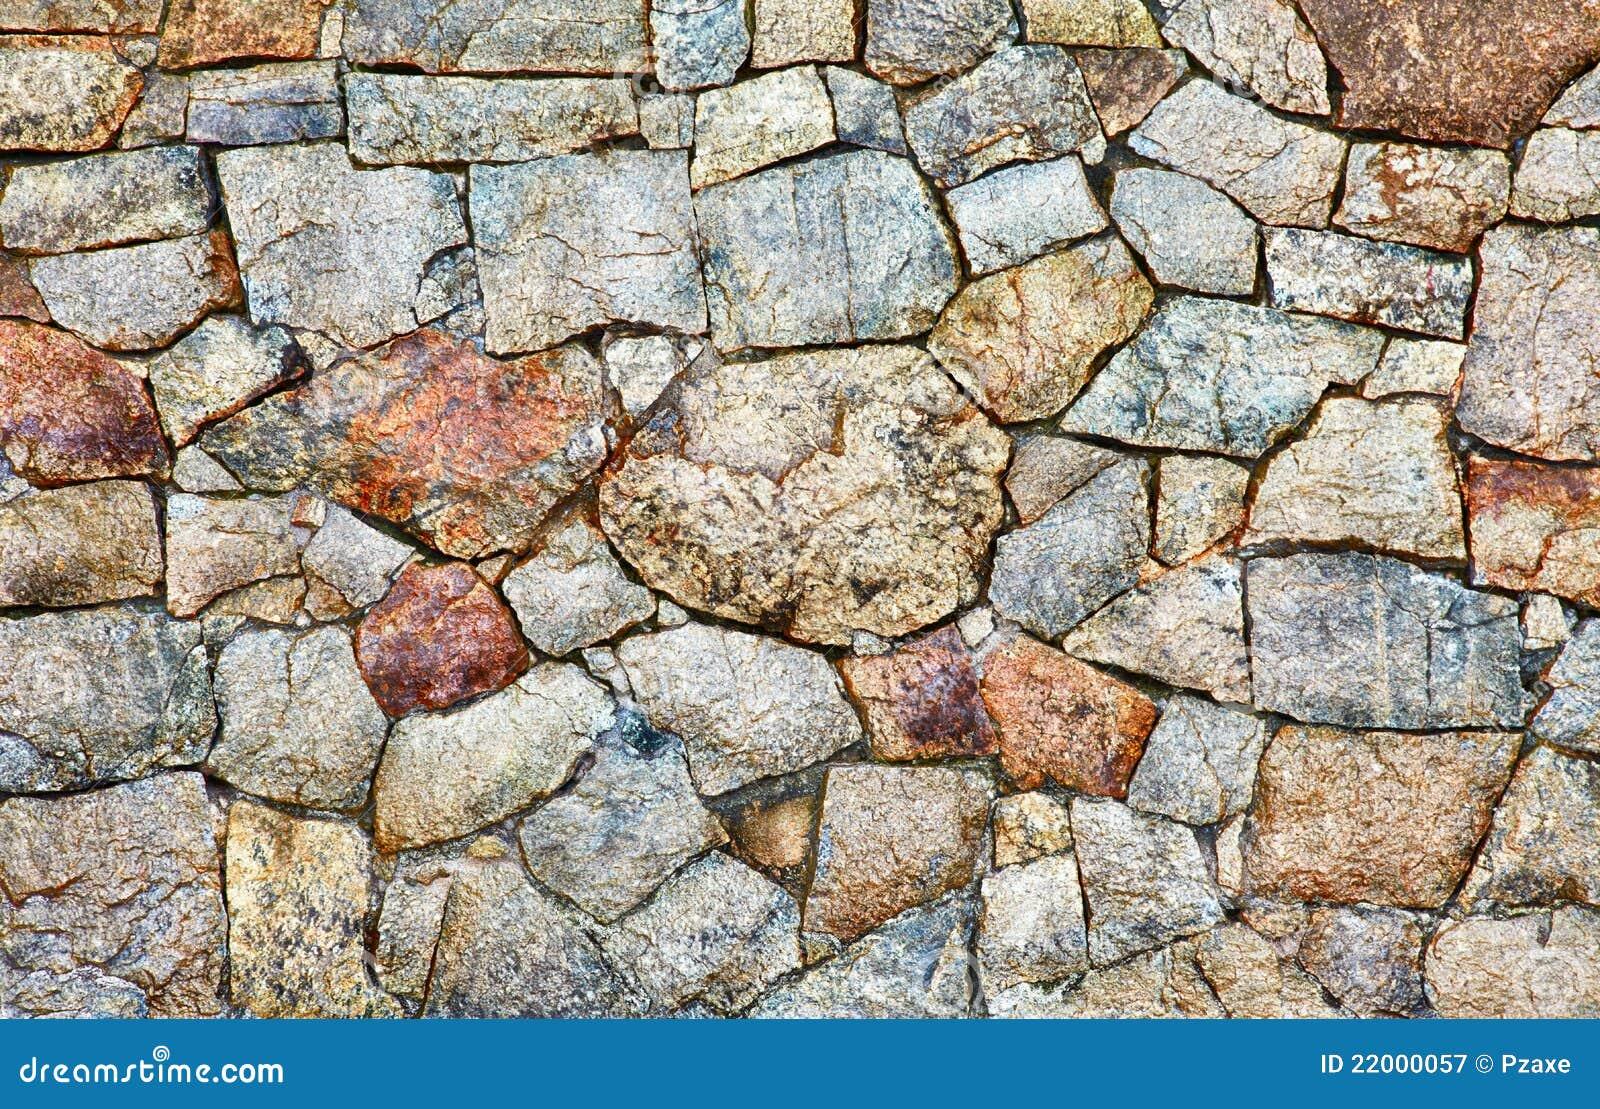 mur en pierre rugueux normal texture image stock image 22000057. Black Bedroom Furniture Sets. Home Design Ideas